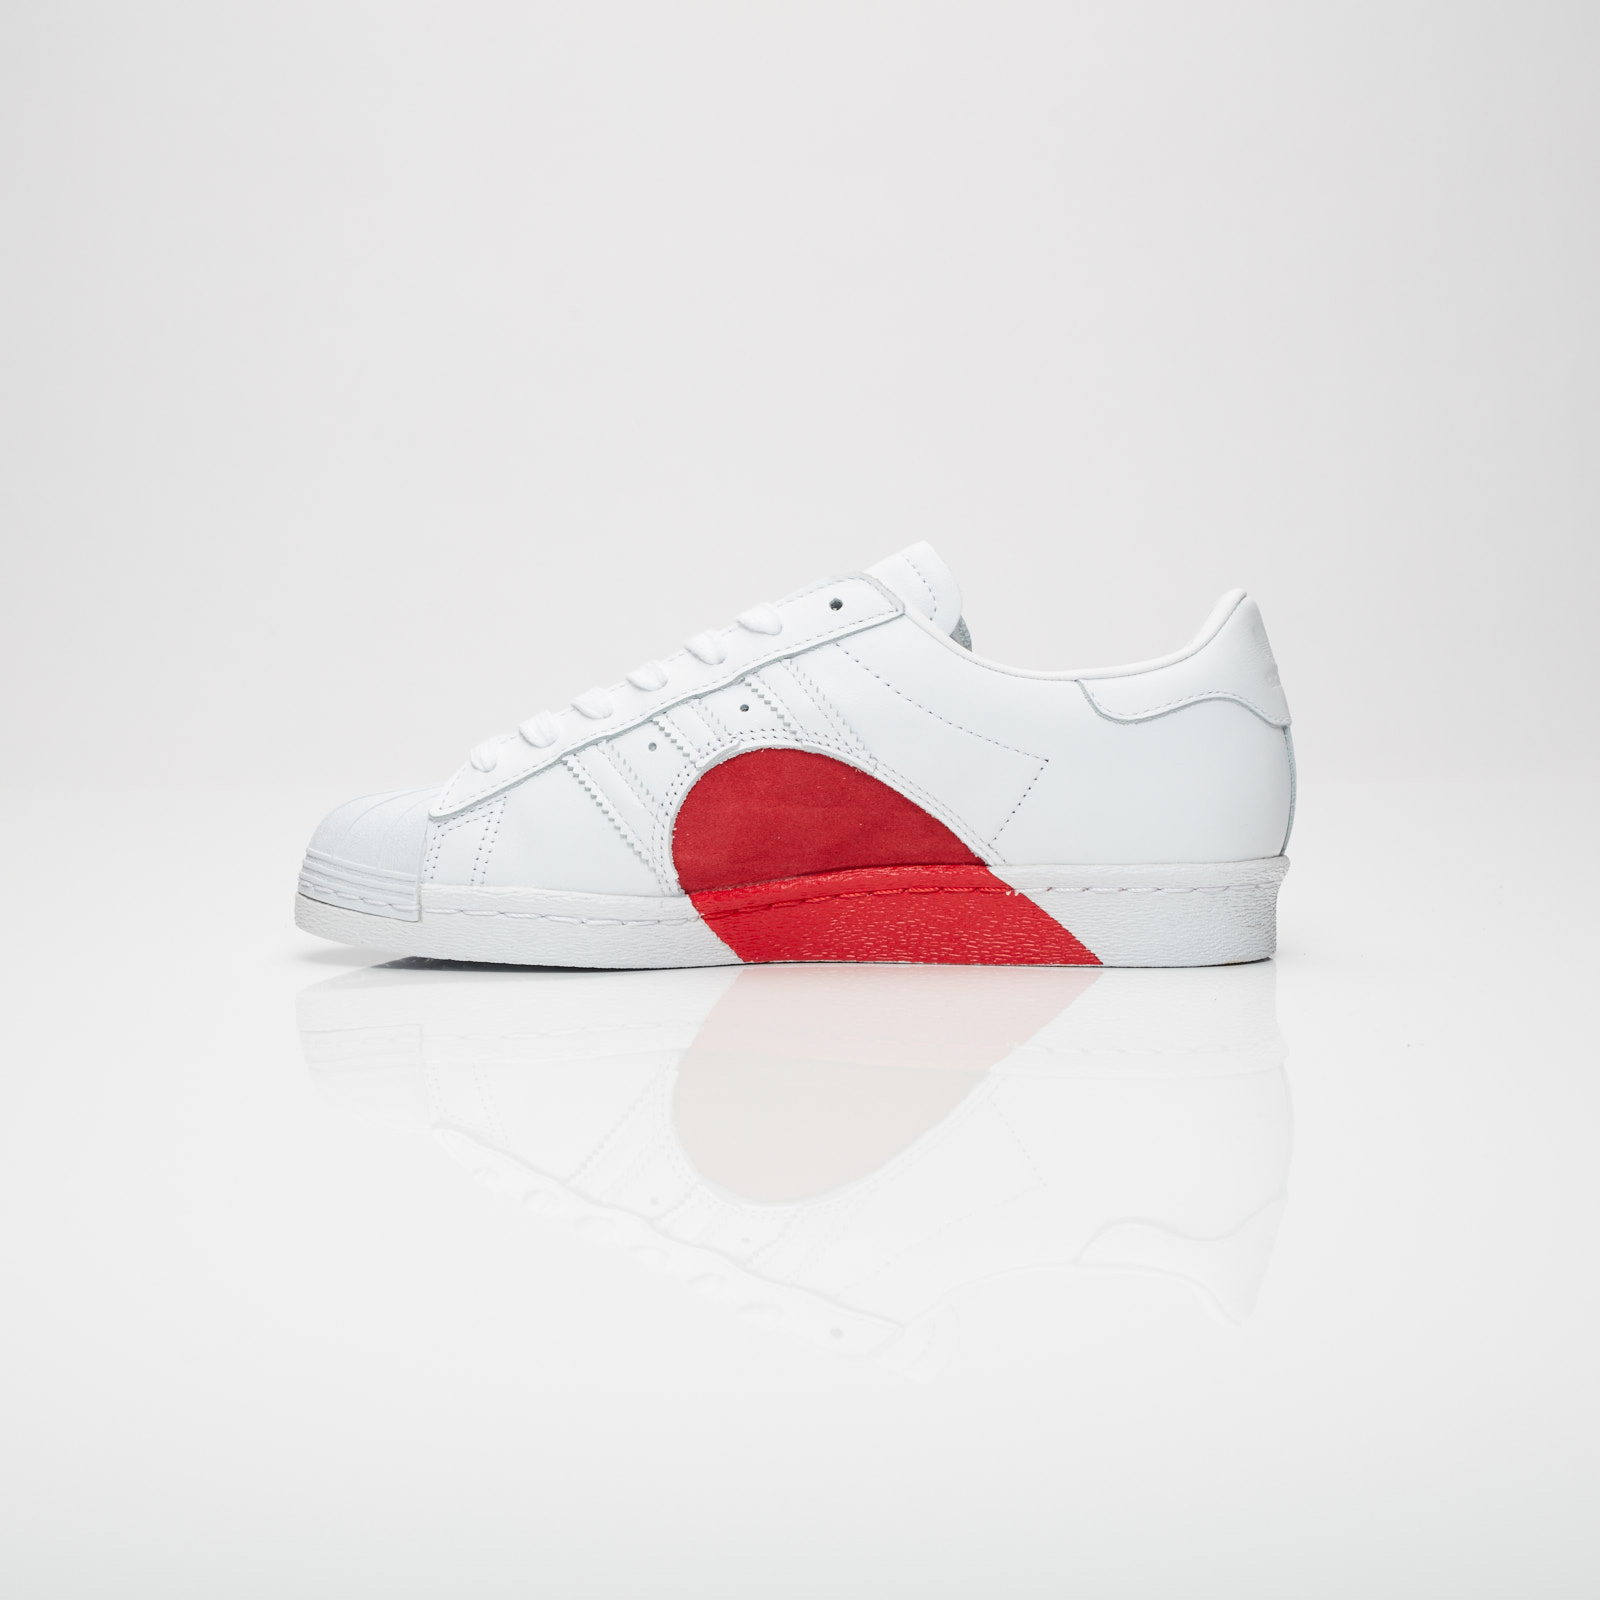 buy popular e2a31 0a30e adidas Superstar 80s HH W - Cq3009 - Sneakersnstuff ...